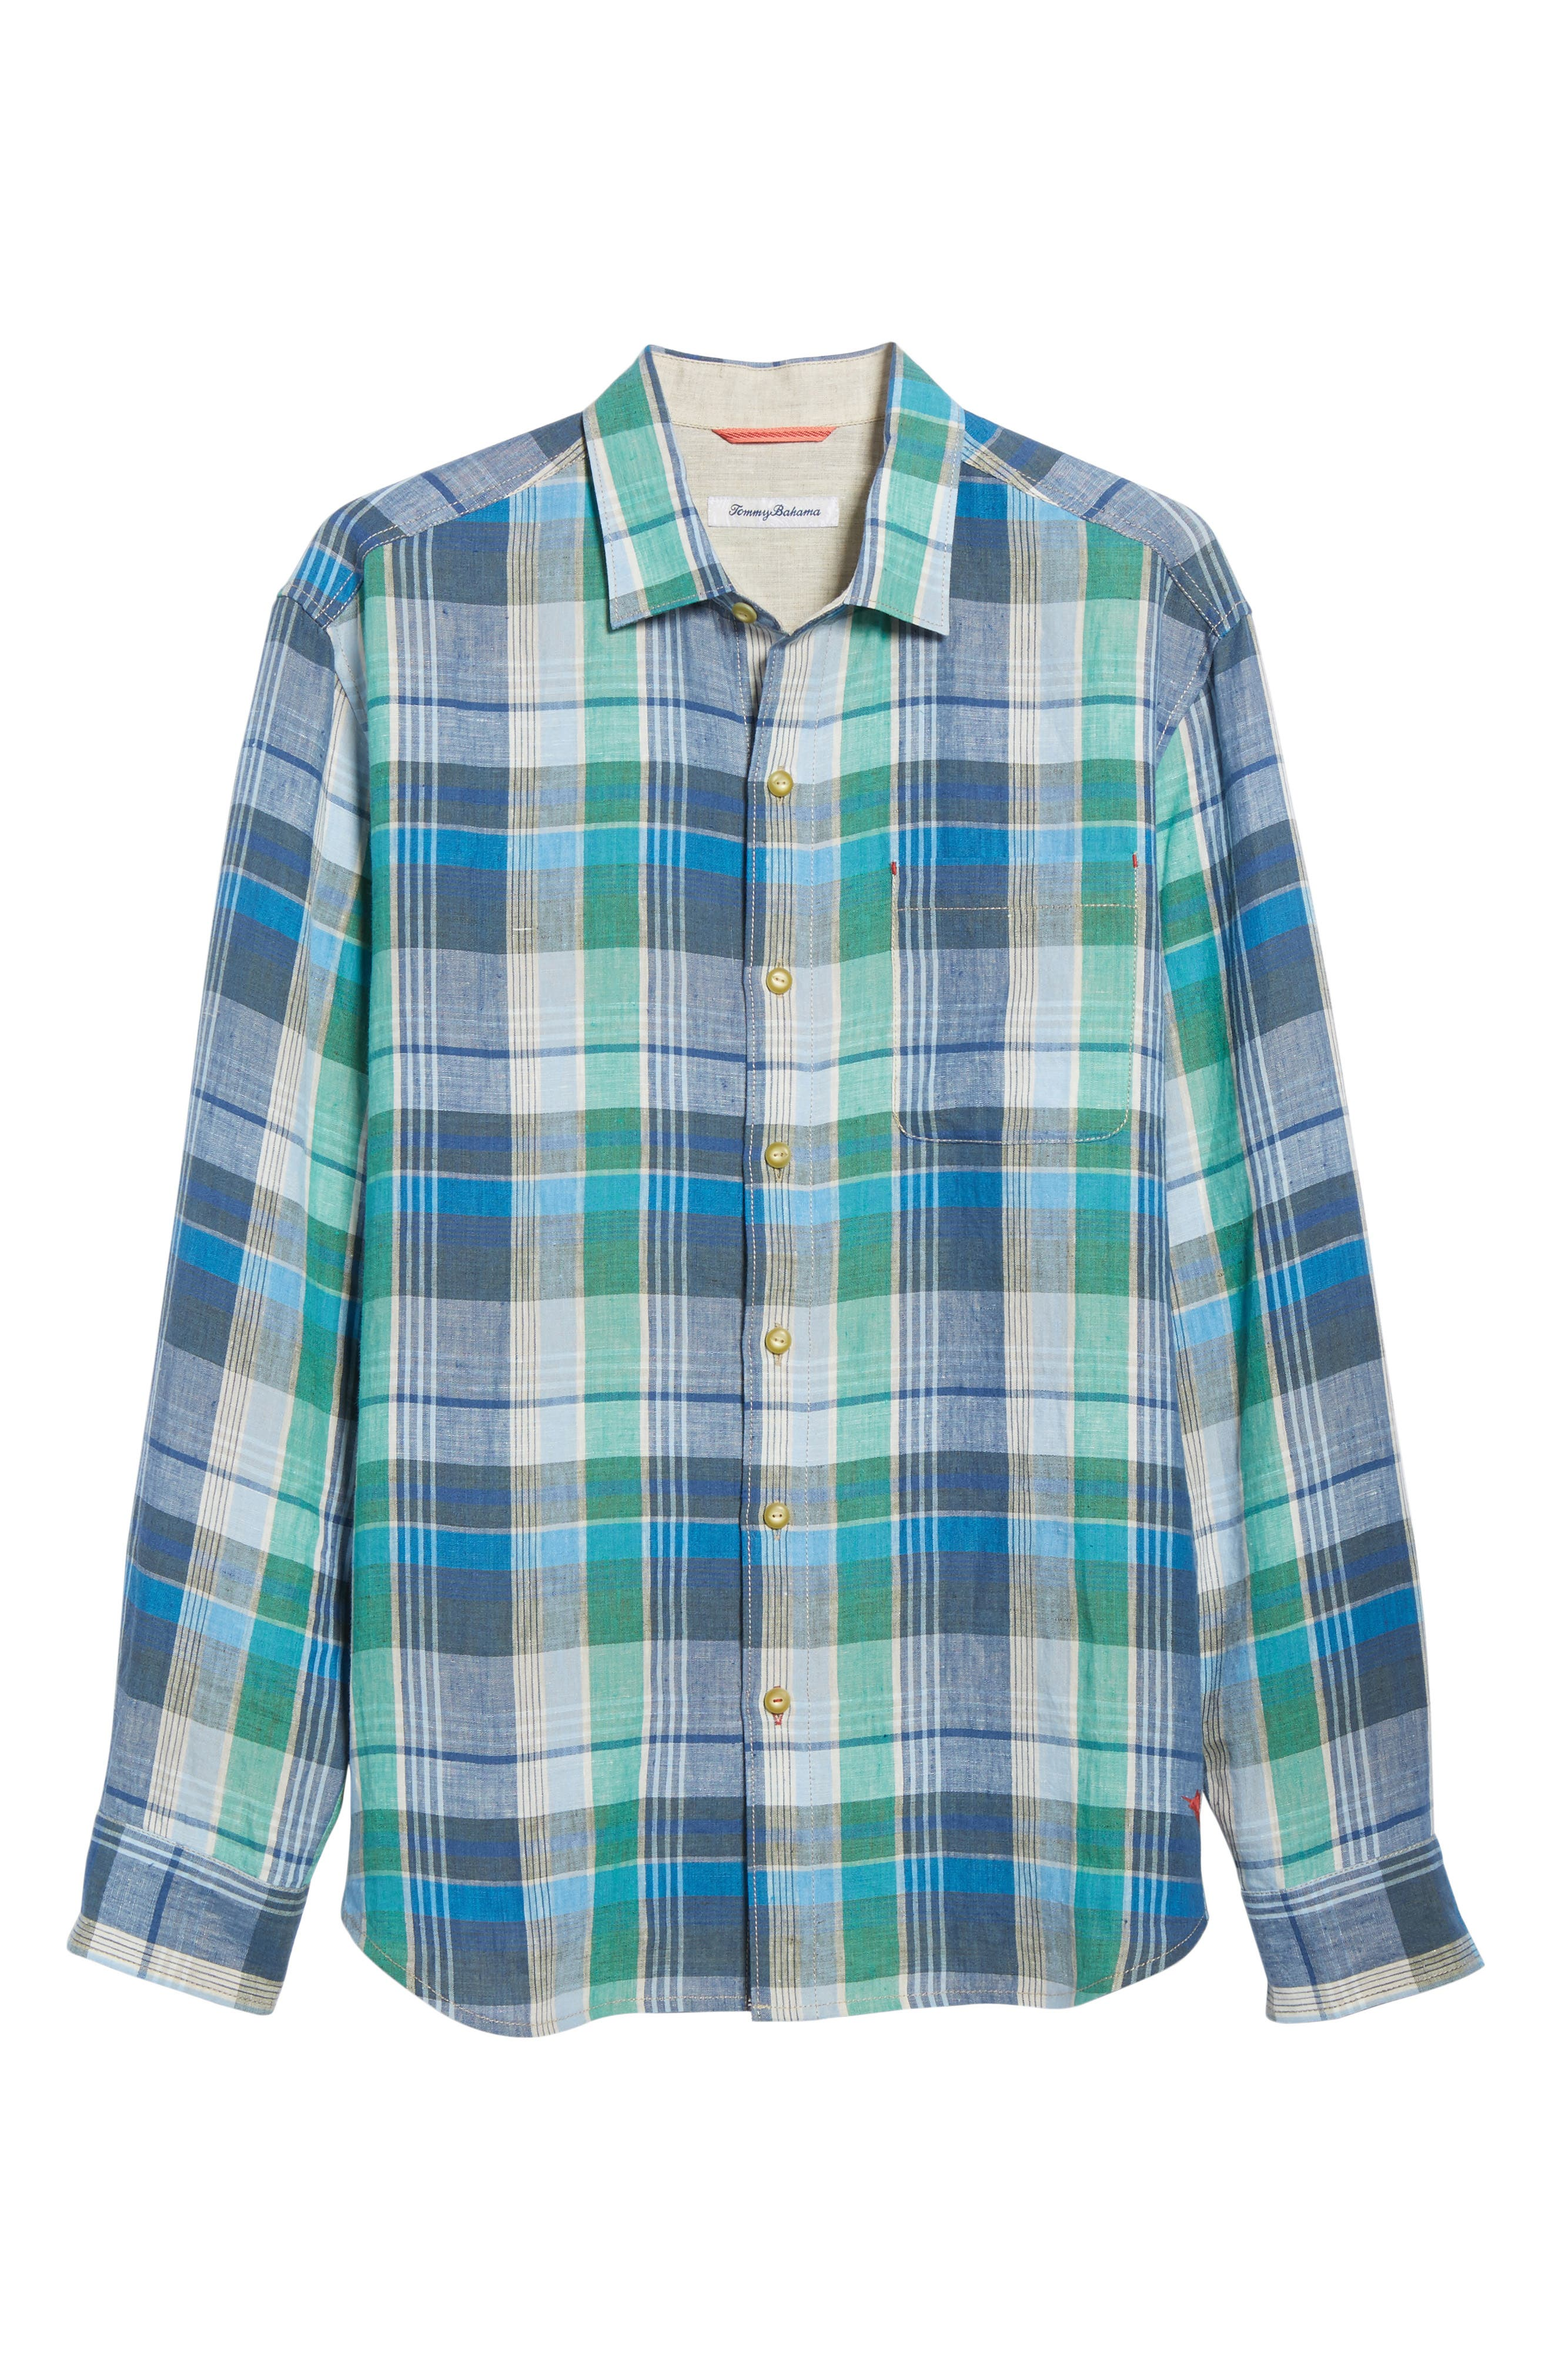 Vero Beach Madras Plaid Linen Sport Shirt,                             Alternate thumbnail 6, color,                             Castaway Green